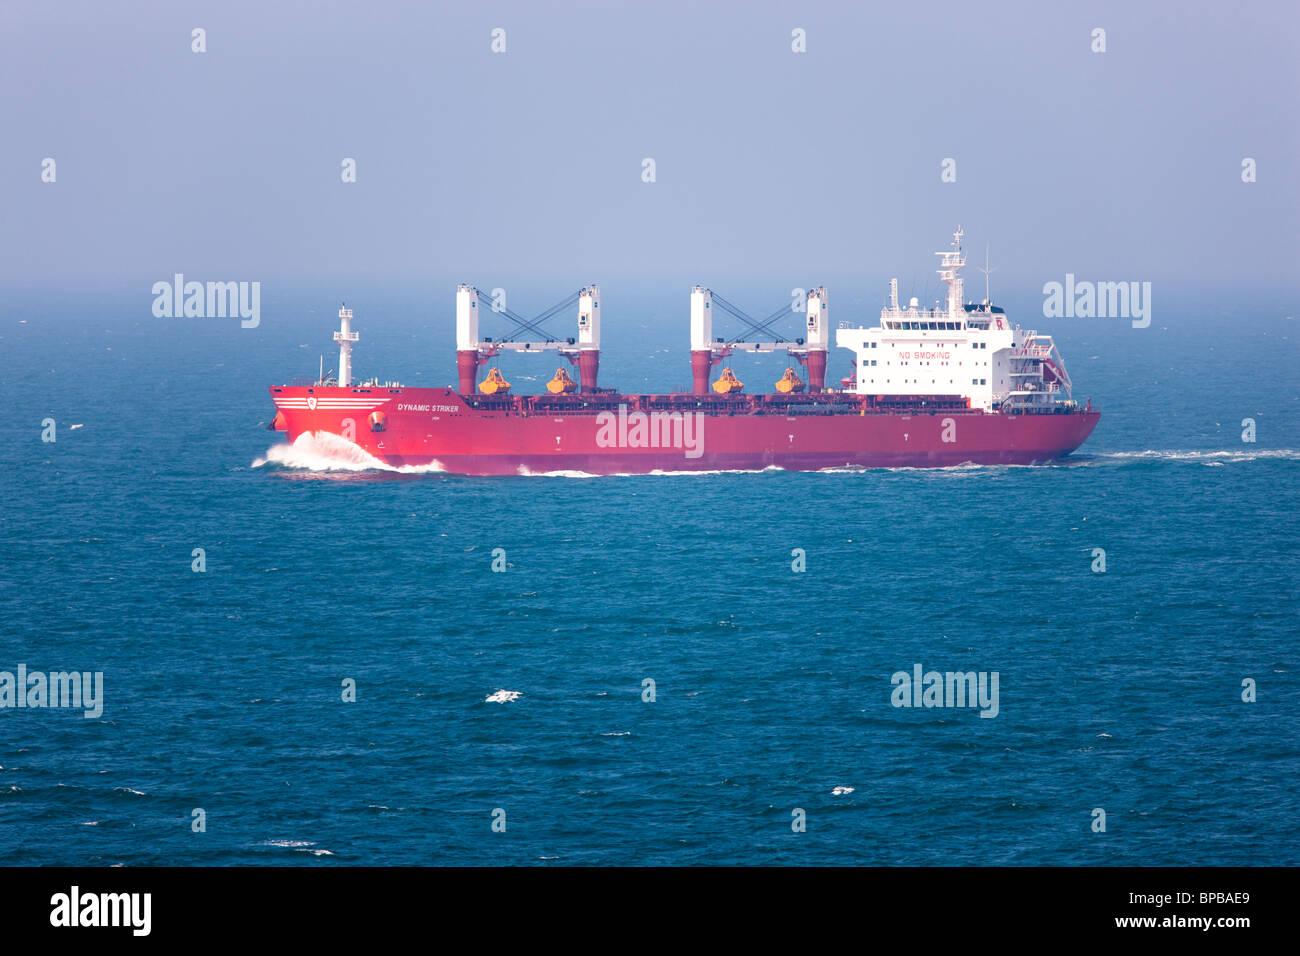 cargo ship dynamic striker at sea - Stock Image